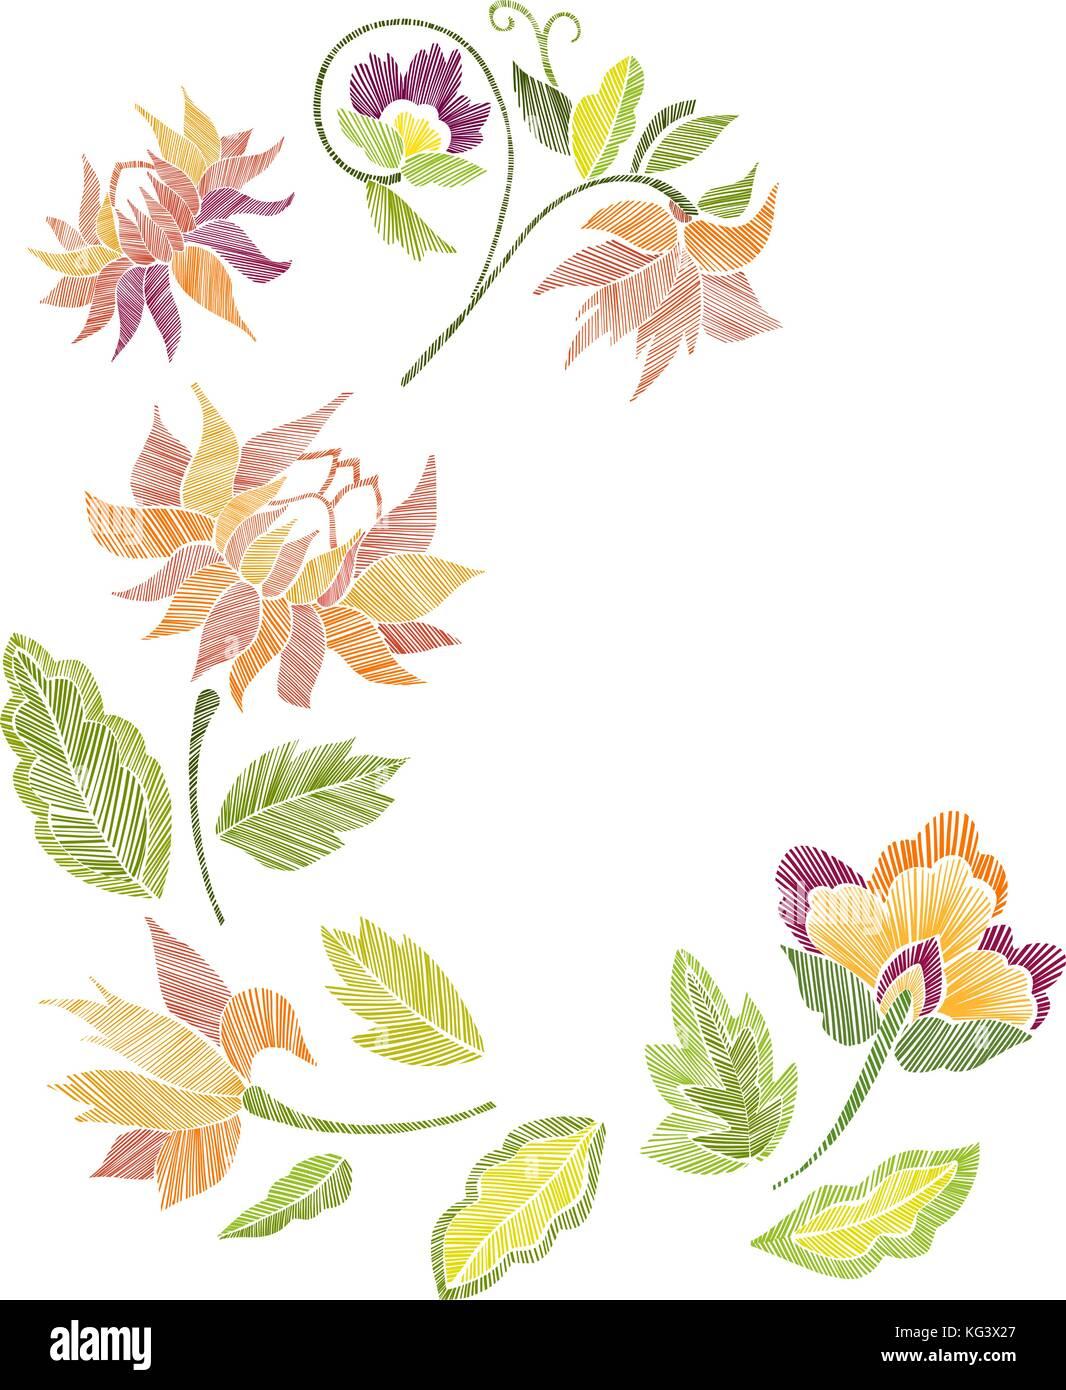 Embroidery Design Stockfotos & Embroidery Design Bilder - Alamy